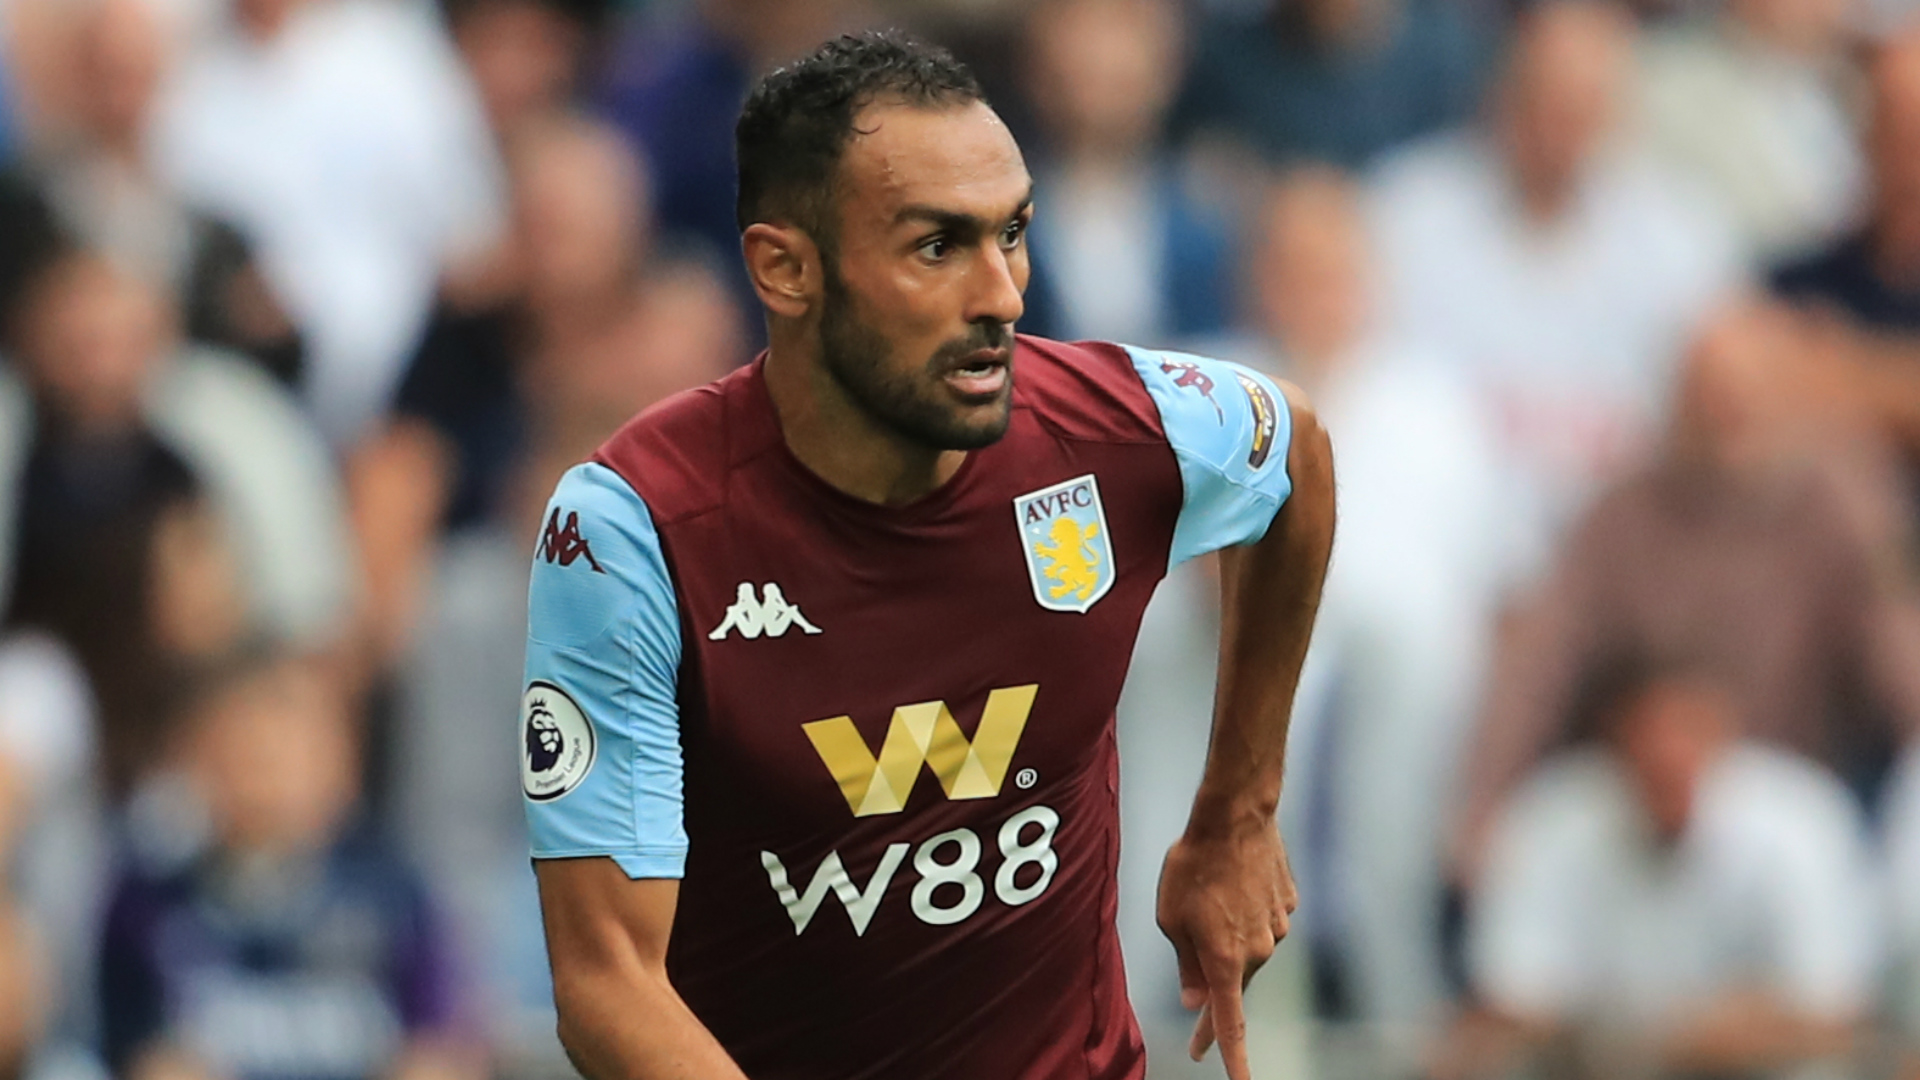 Aston Villa defender Elmohamady eyes retirement in England